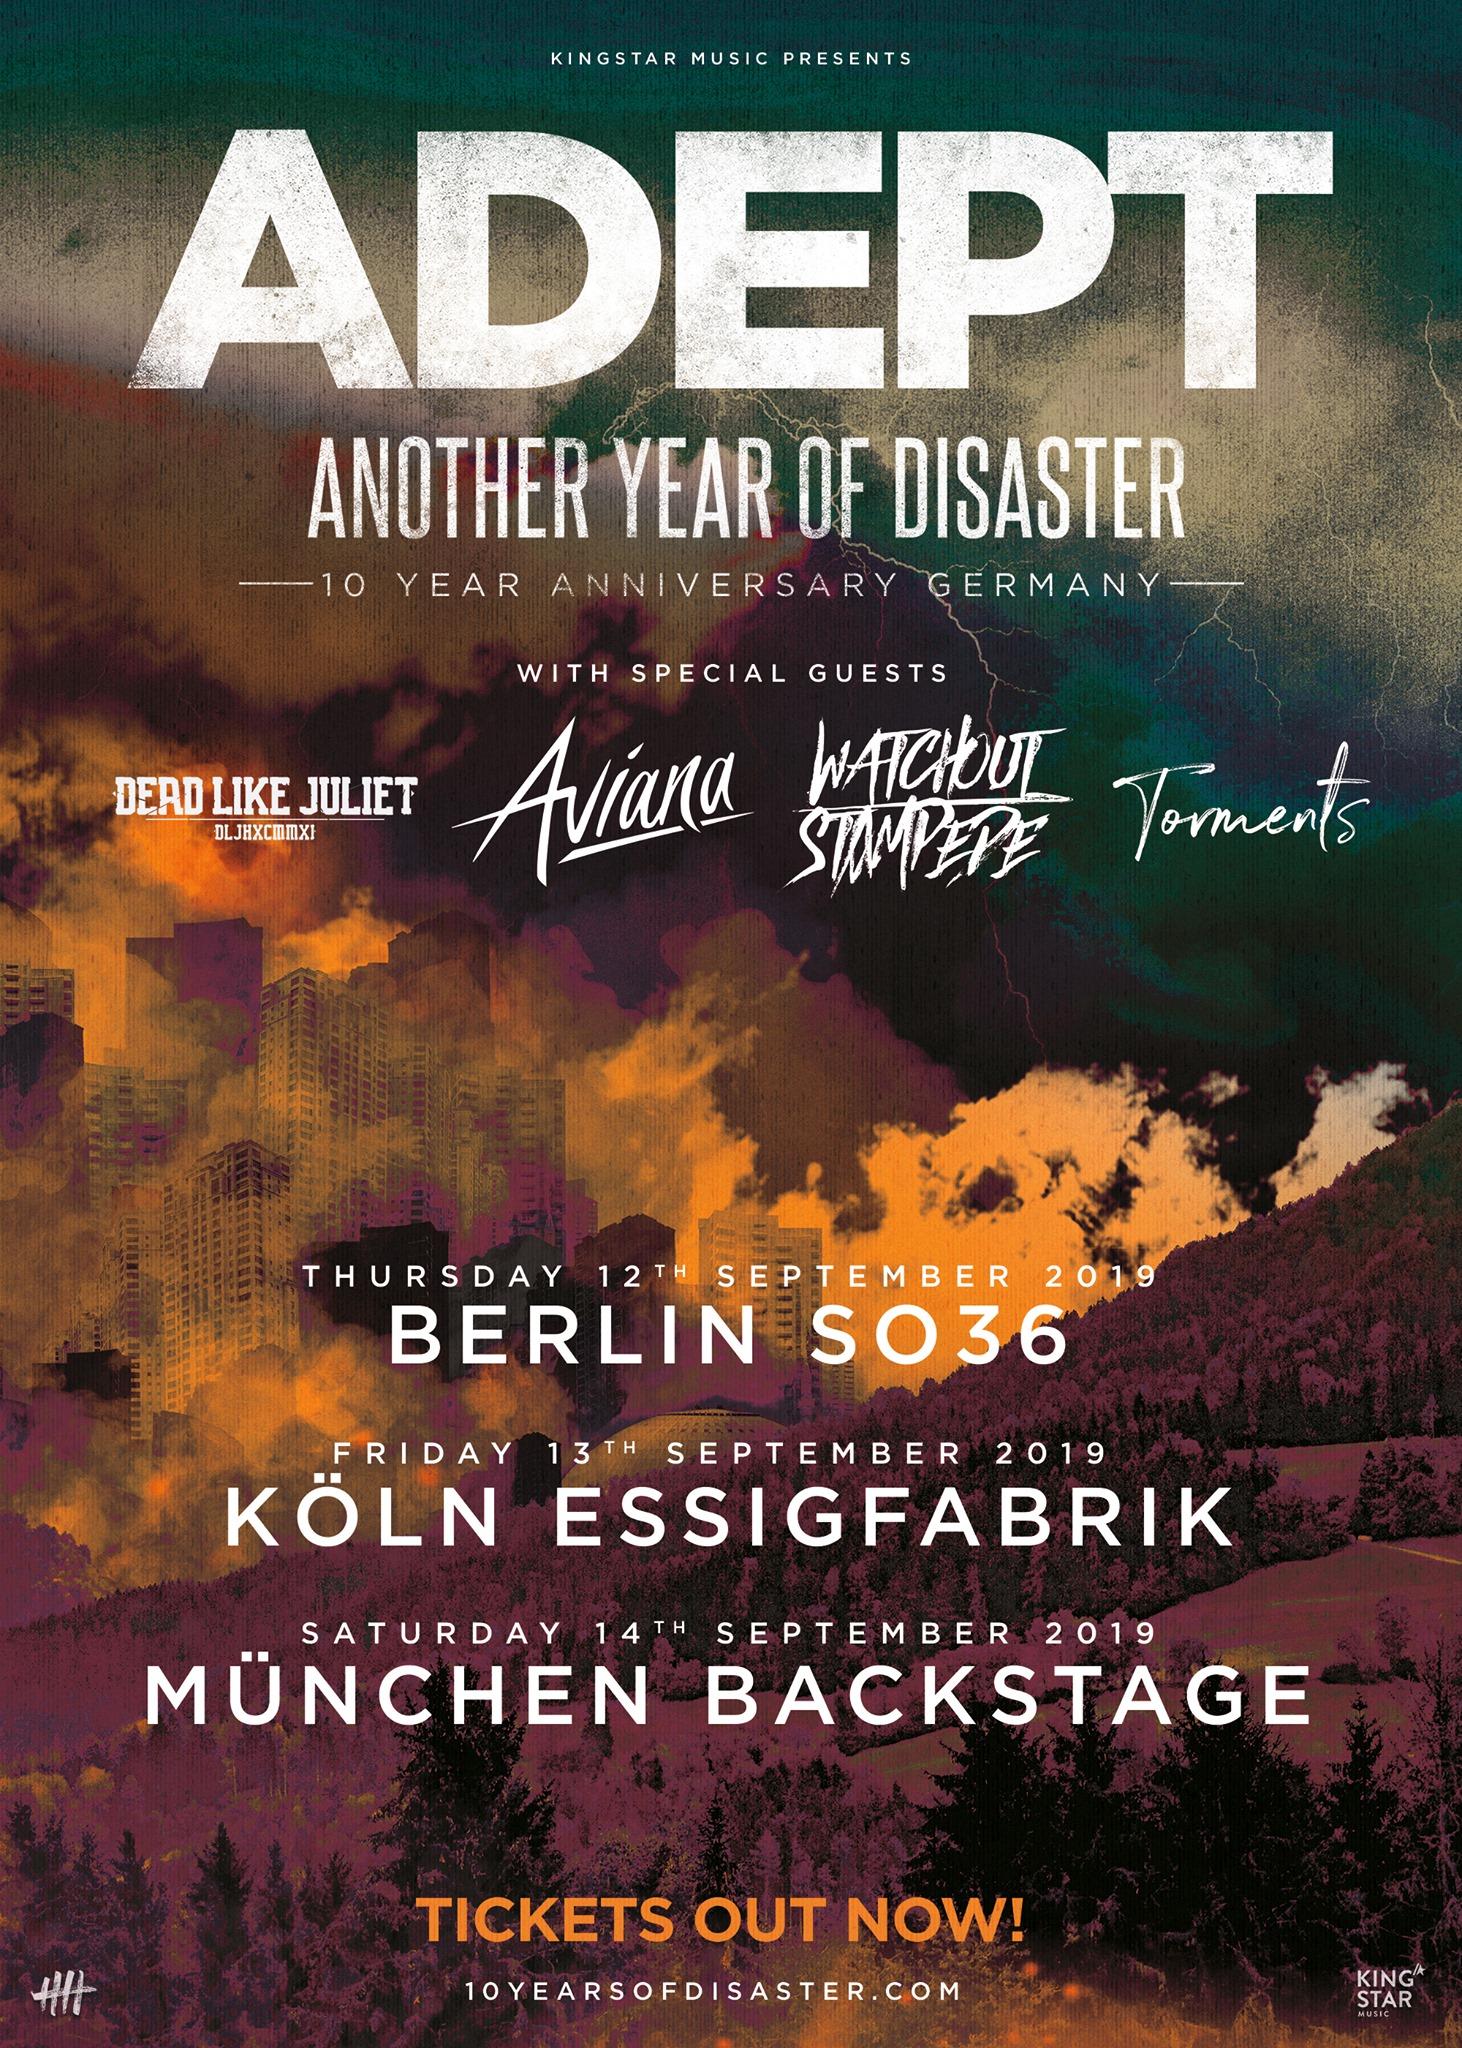 Tourplakat Adept - Another Year Of Disaster Tour 2019